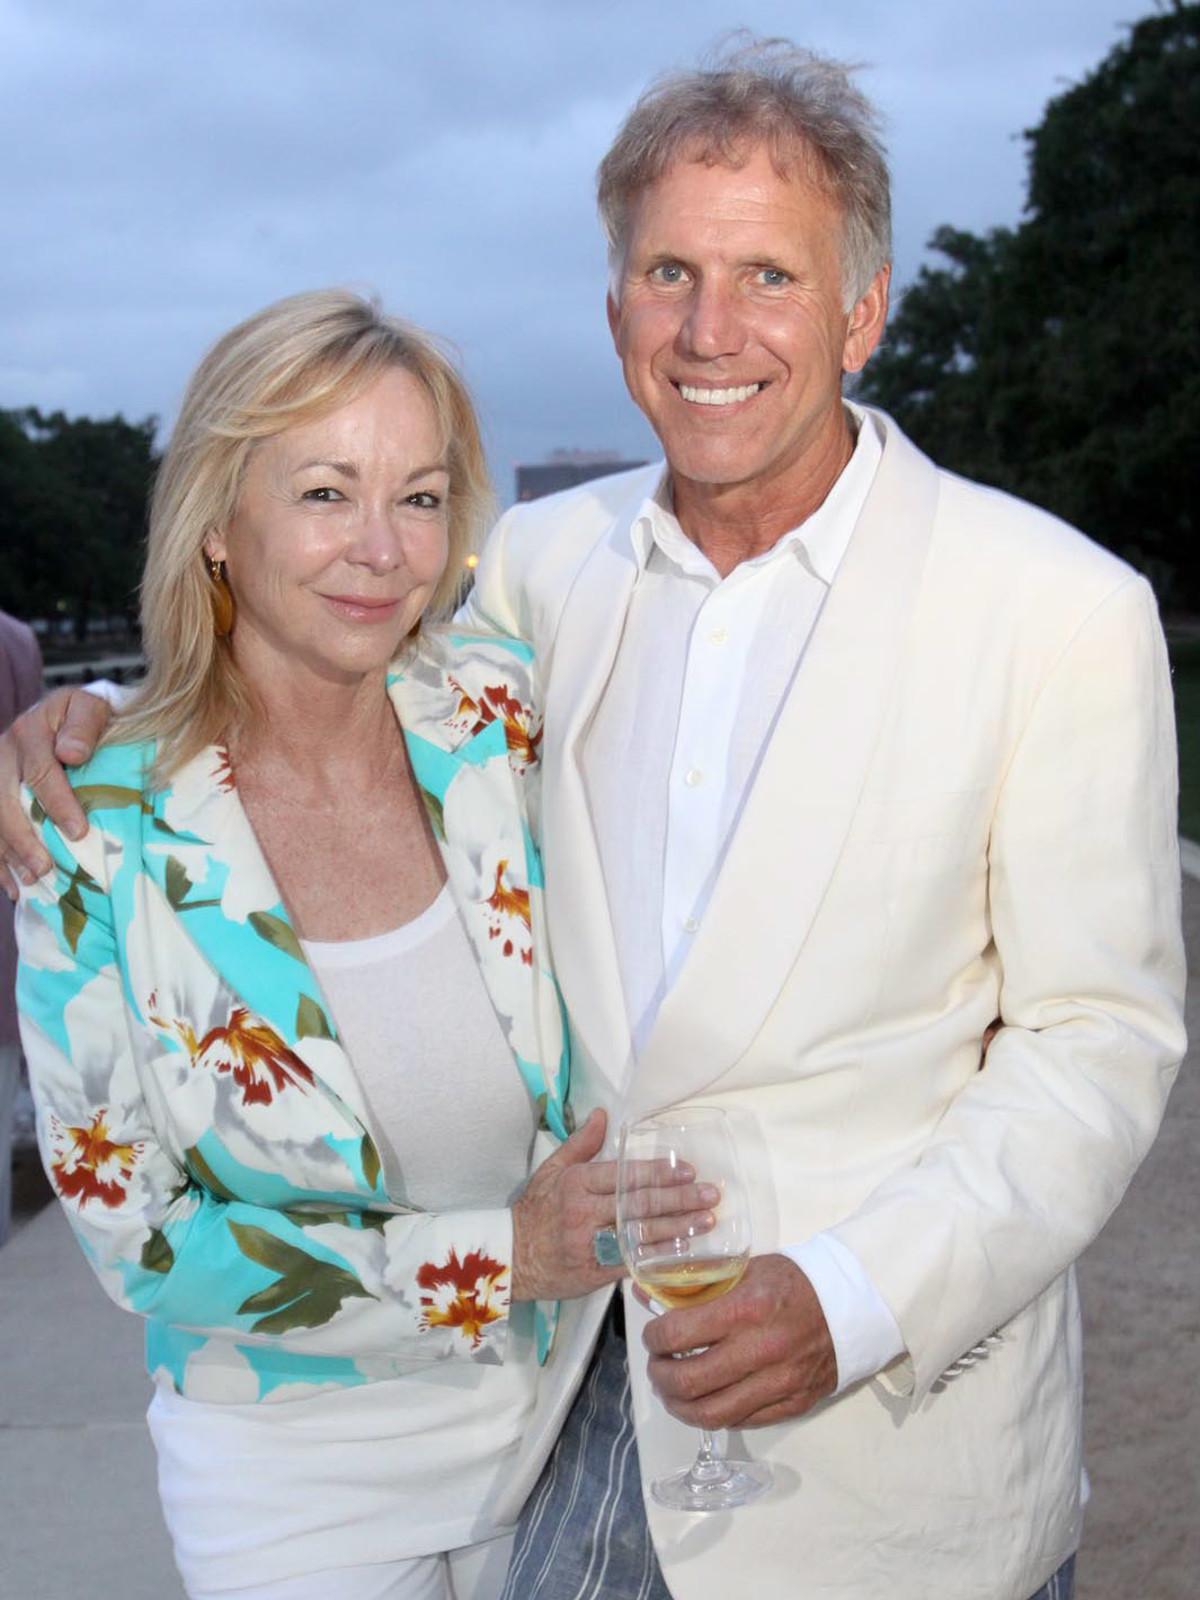 News_Park party_May 2010_Candice Schiller_Lonnie Schiller